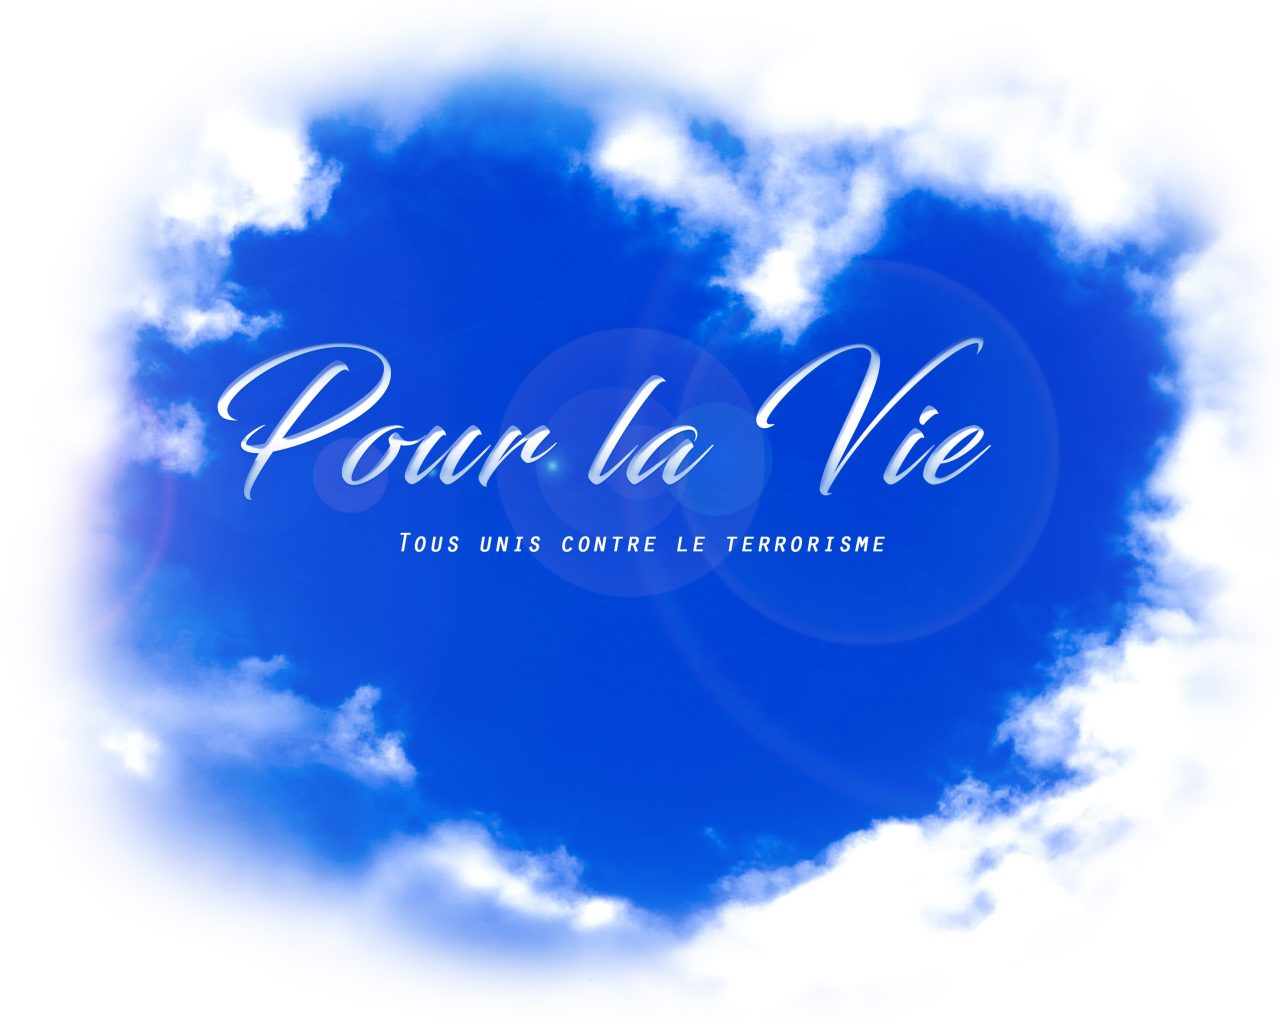 ACE-POUR-LA-VIE-INVITATION-IMG02-V2-1-1280x1024.jpg